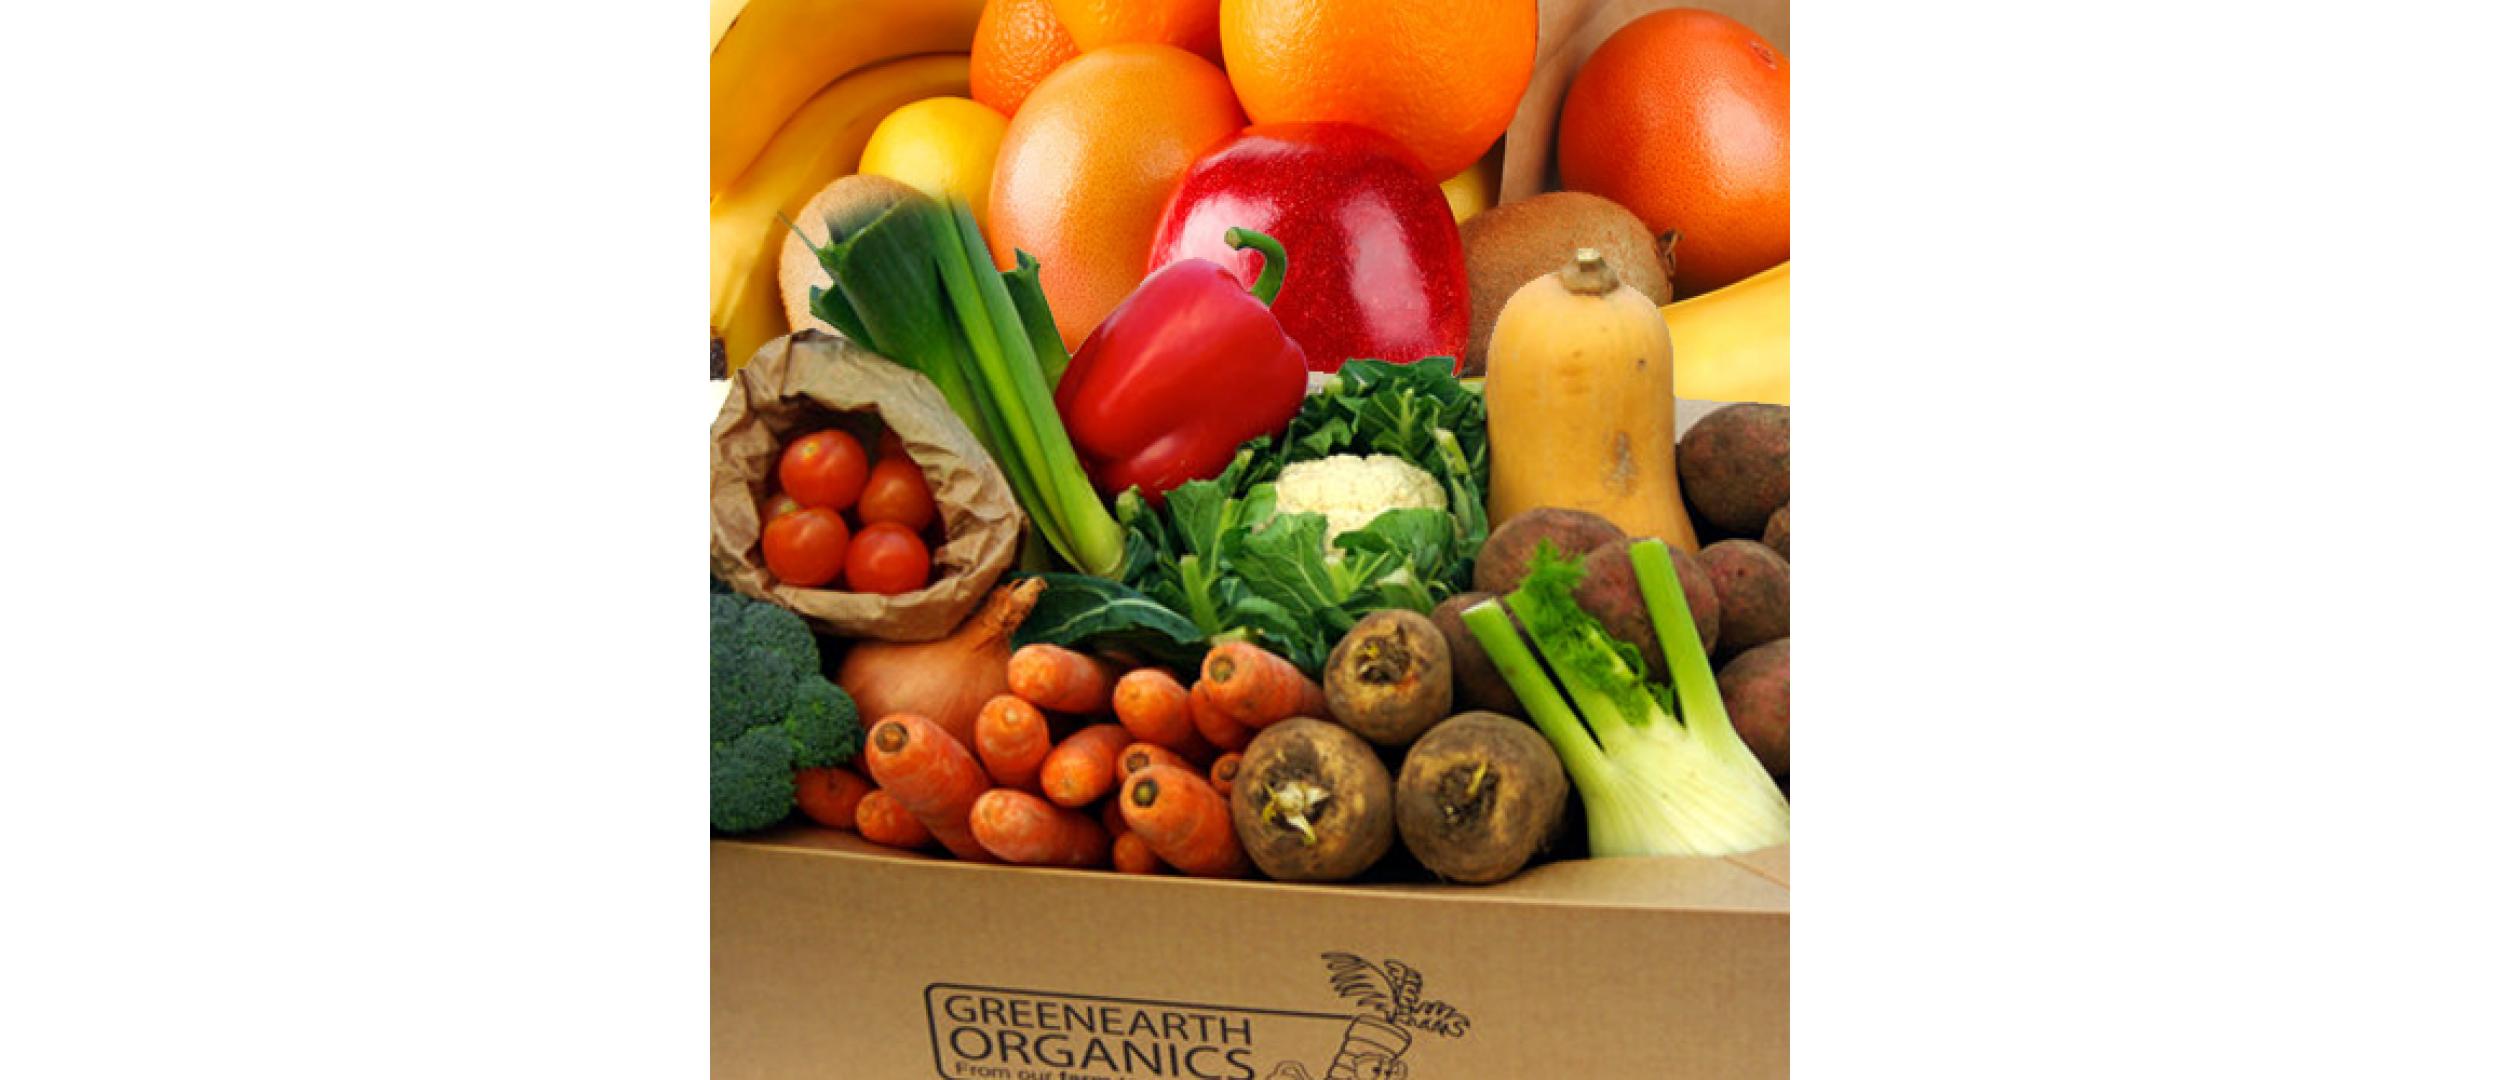 Veg & Fruit Boxes